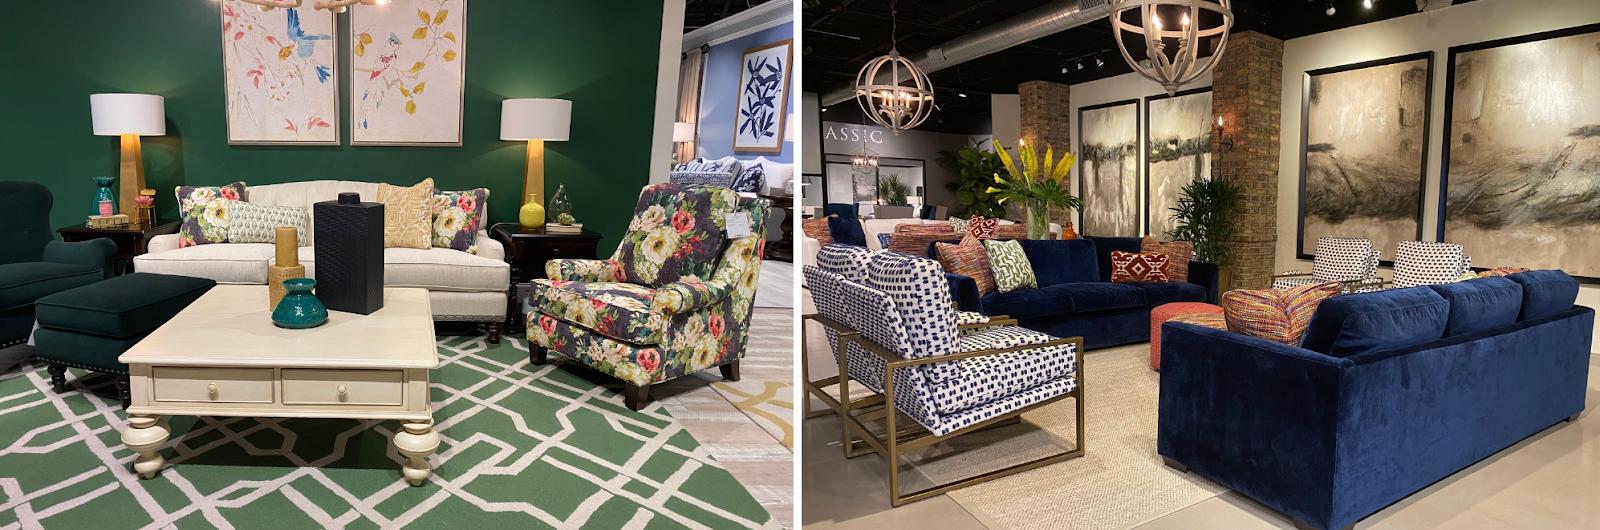 superior-construction-lebanon-tn-select-durable-fabrics-bold-vibrant-navy-and-emerald-inspired-showroom-set-ups